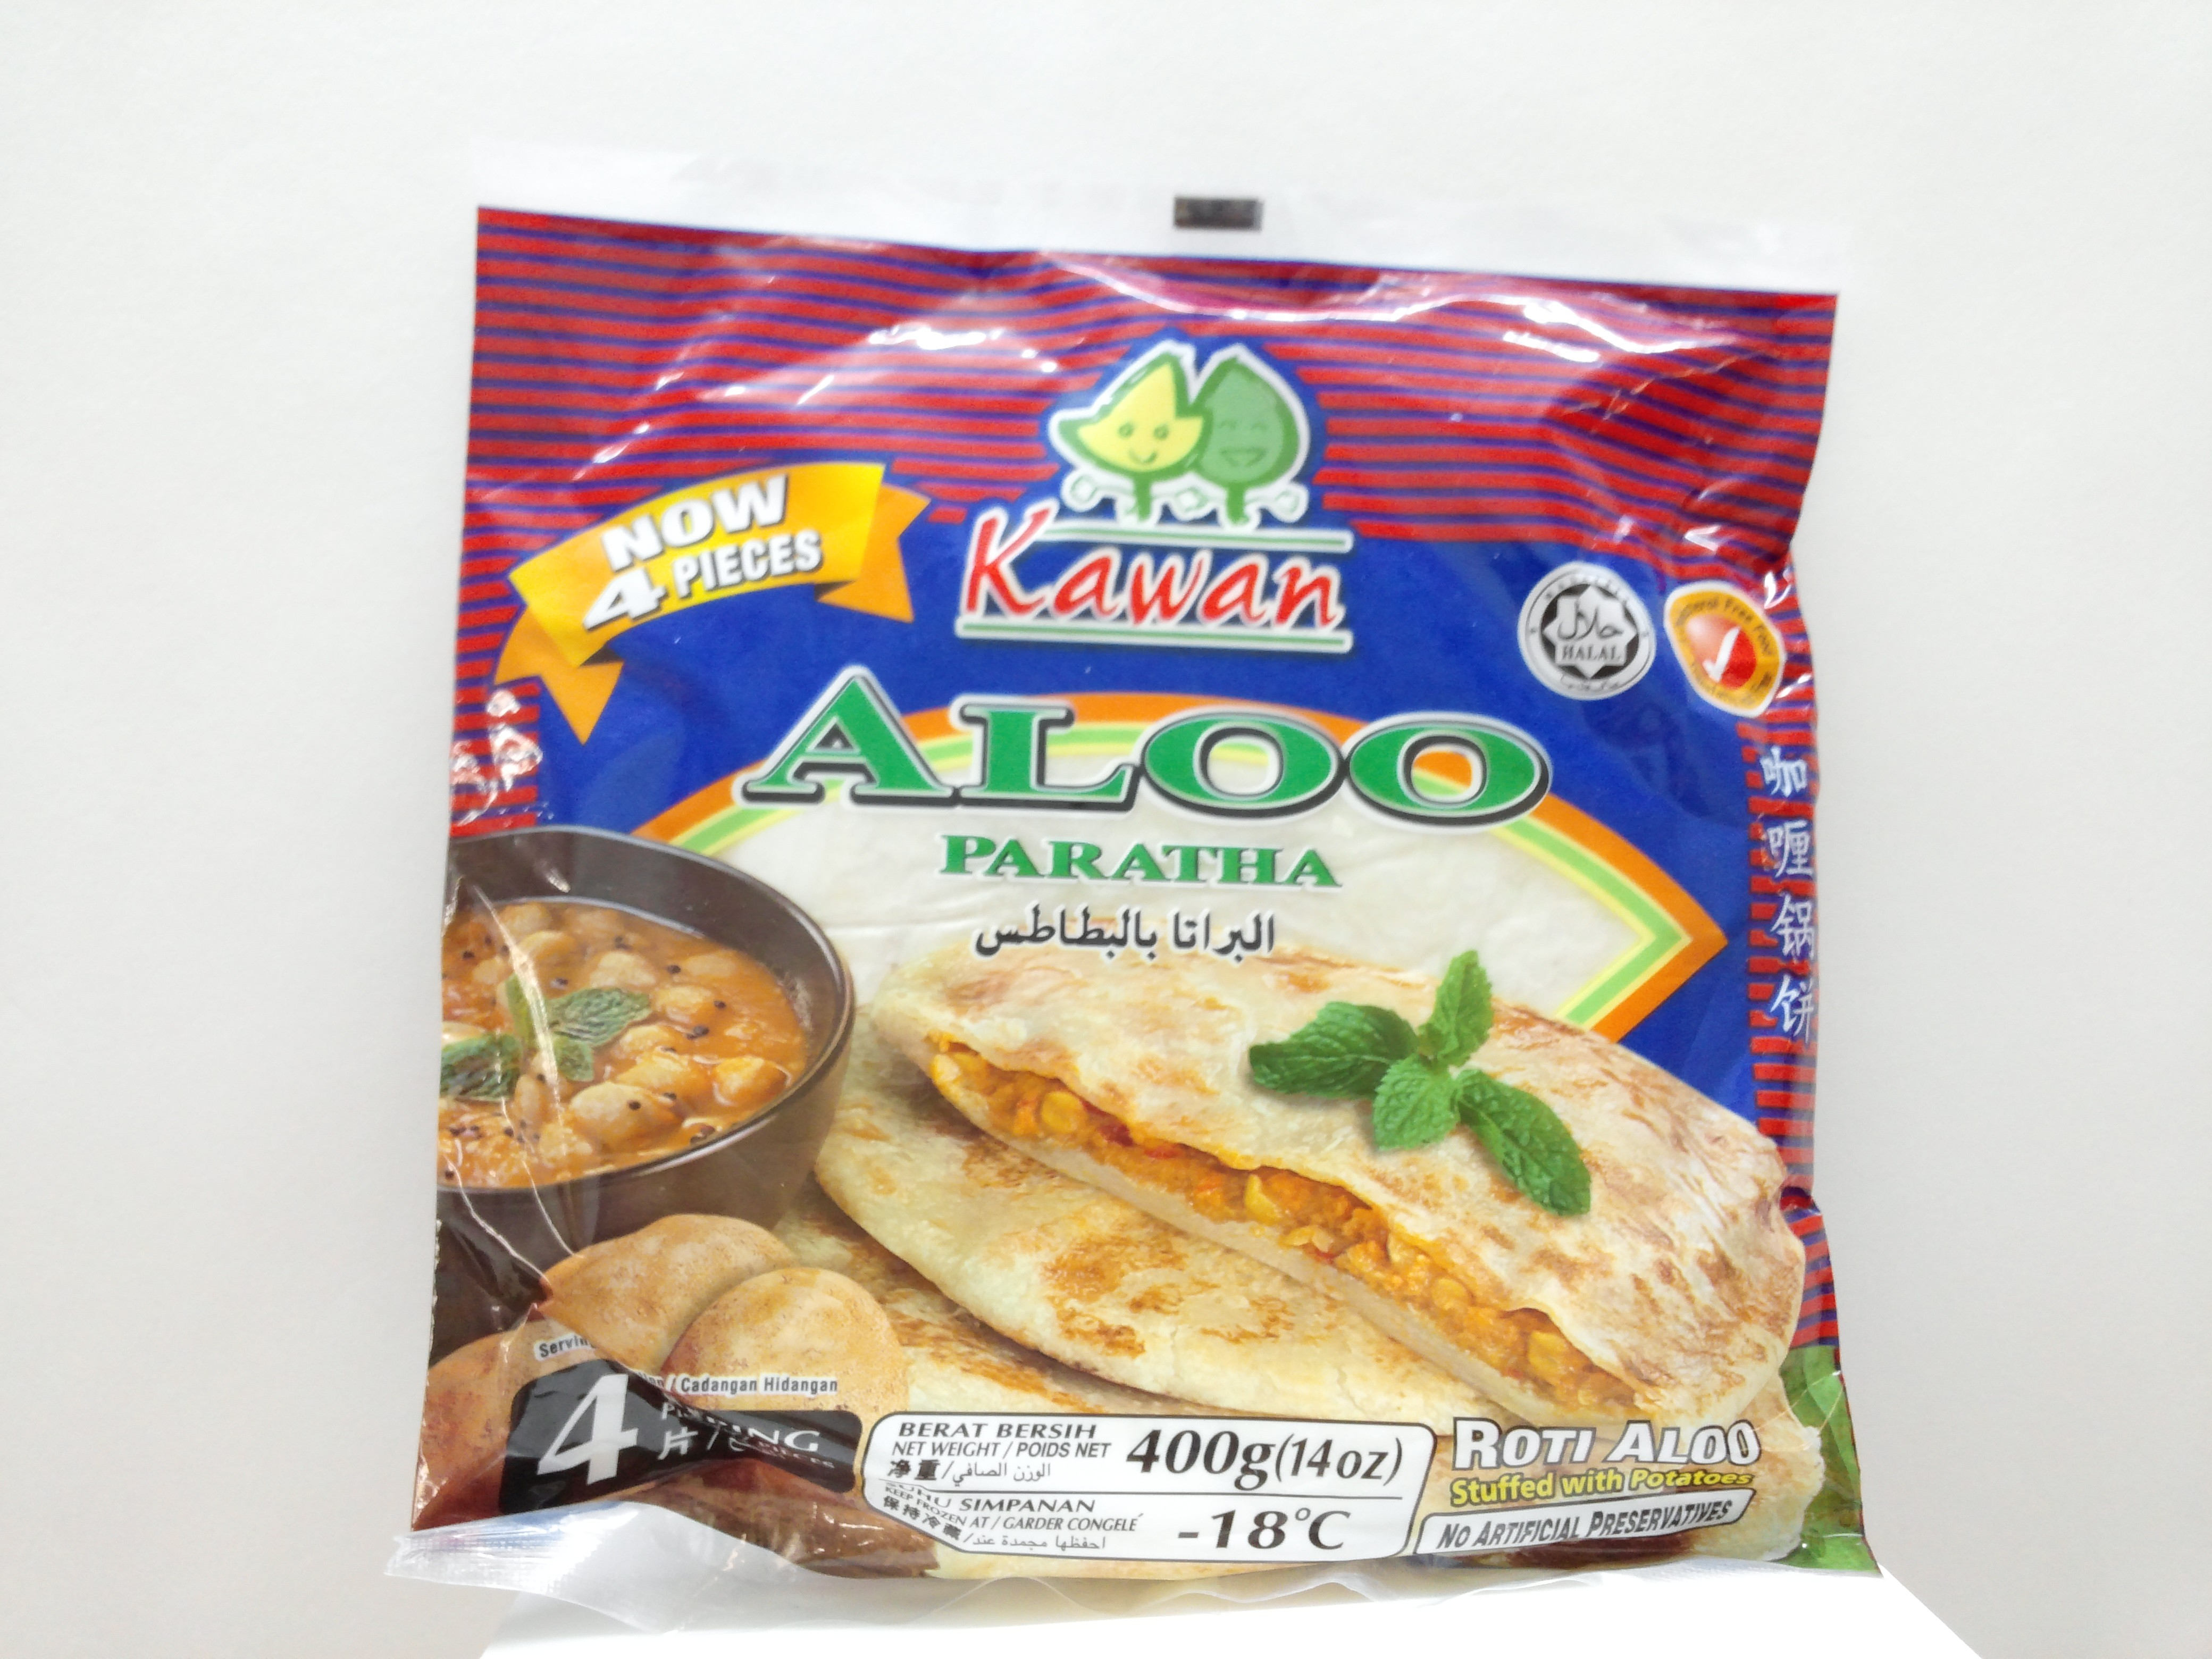 Roti Paratha Kawan Kawan Aloo Paratha 4 Pcs 14 oz